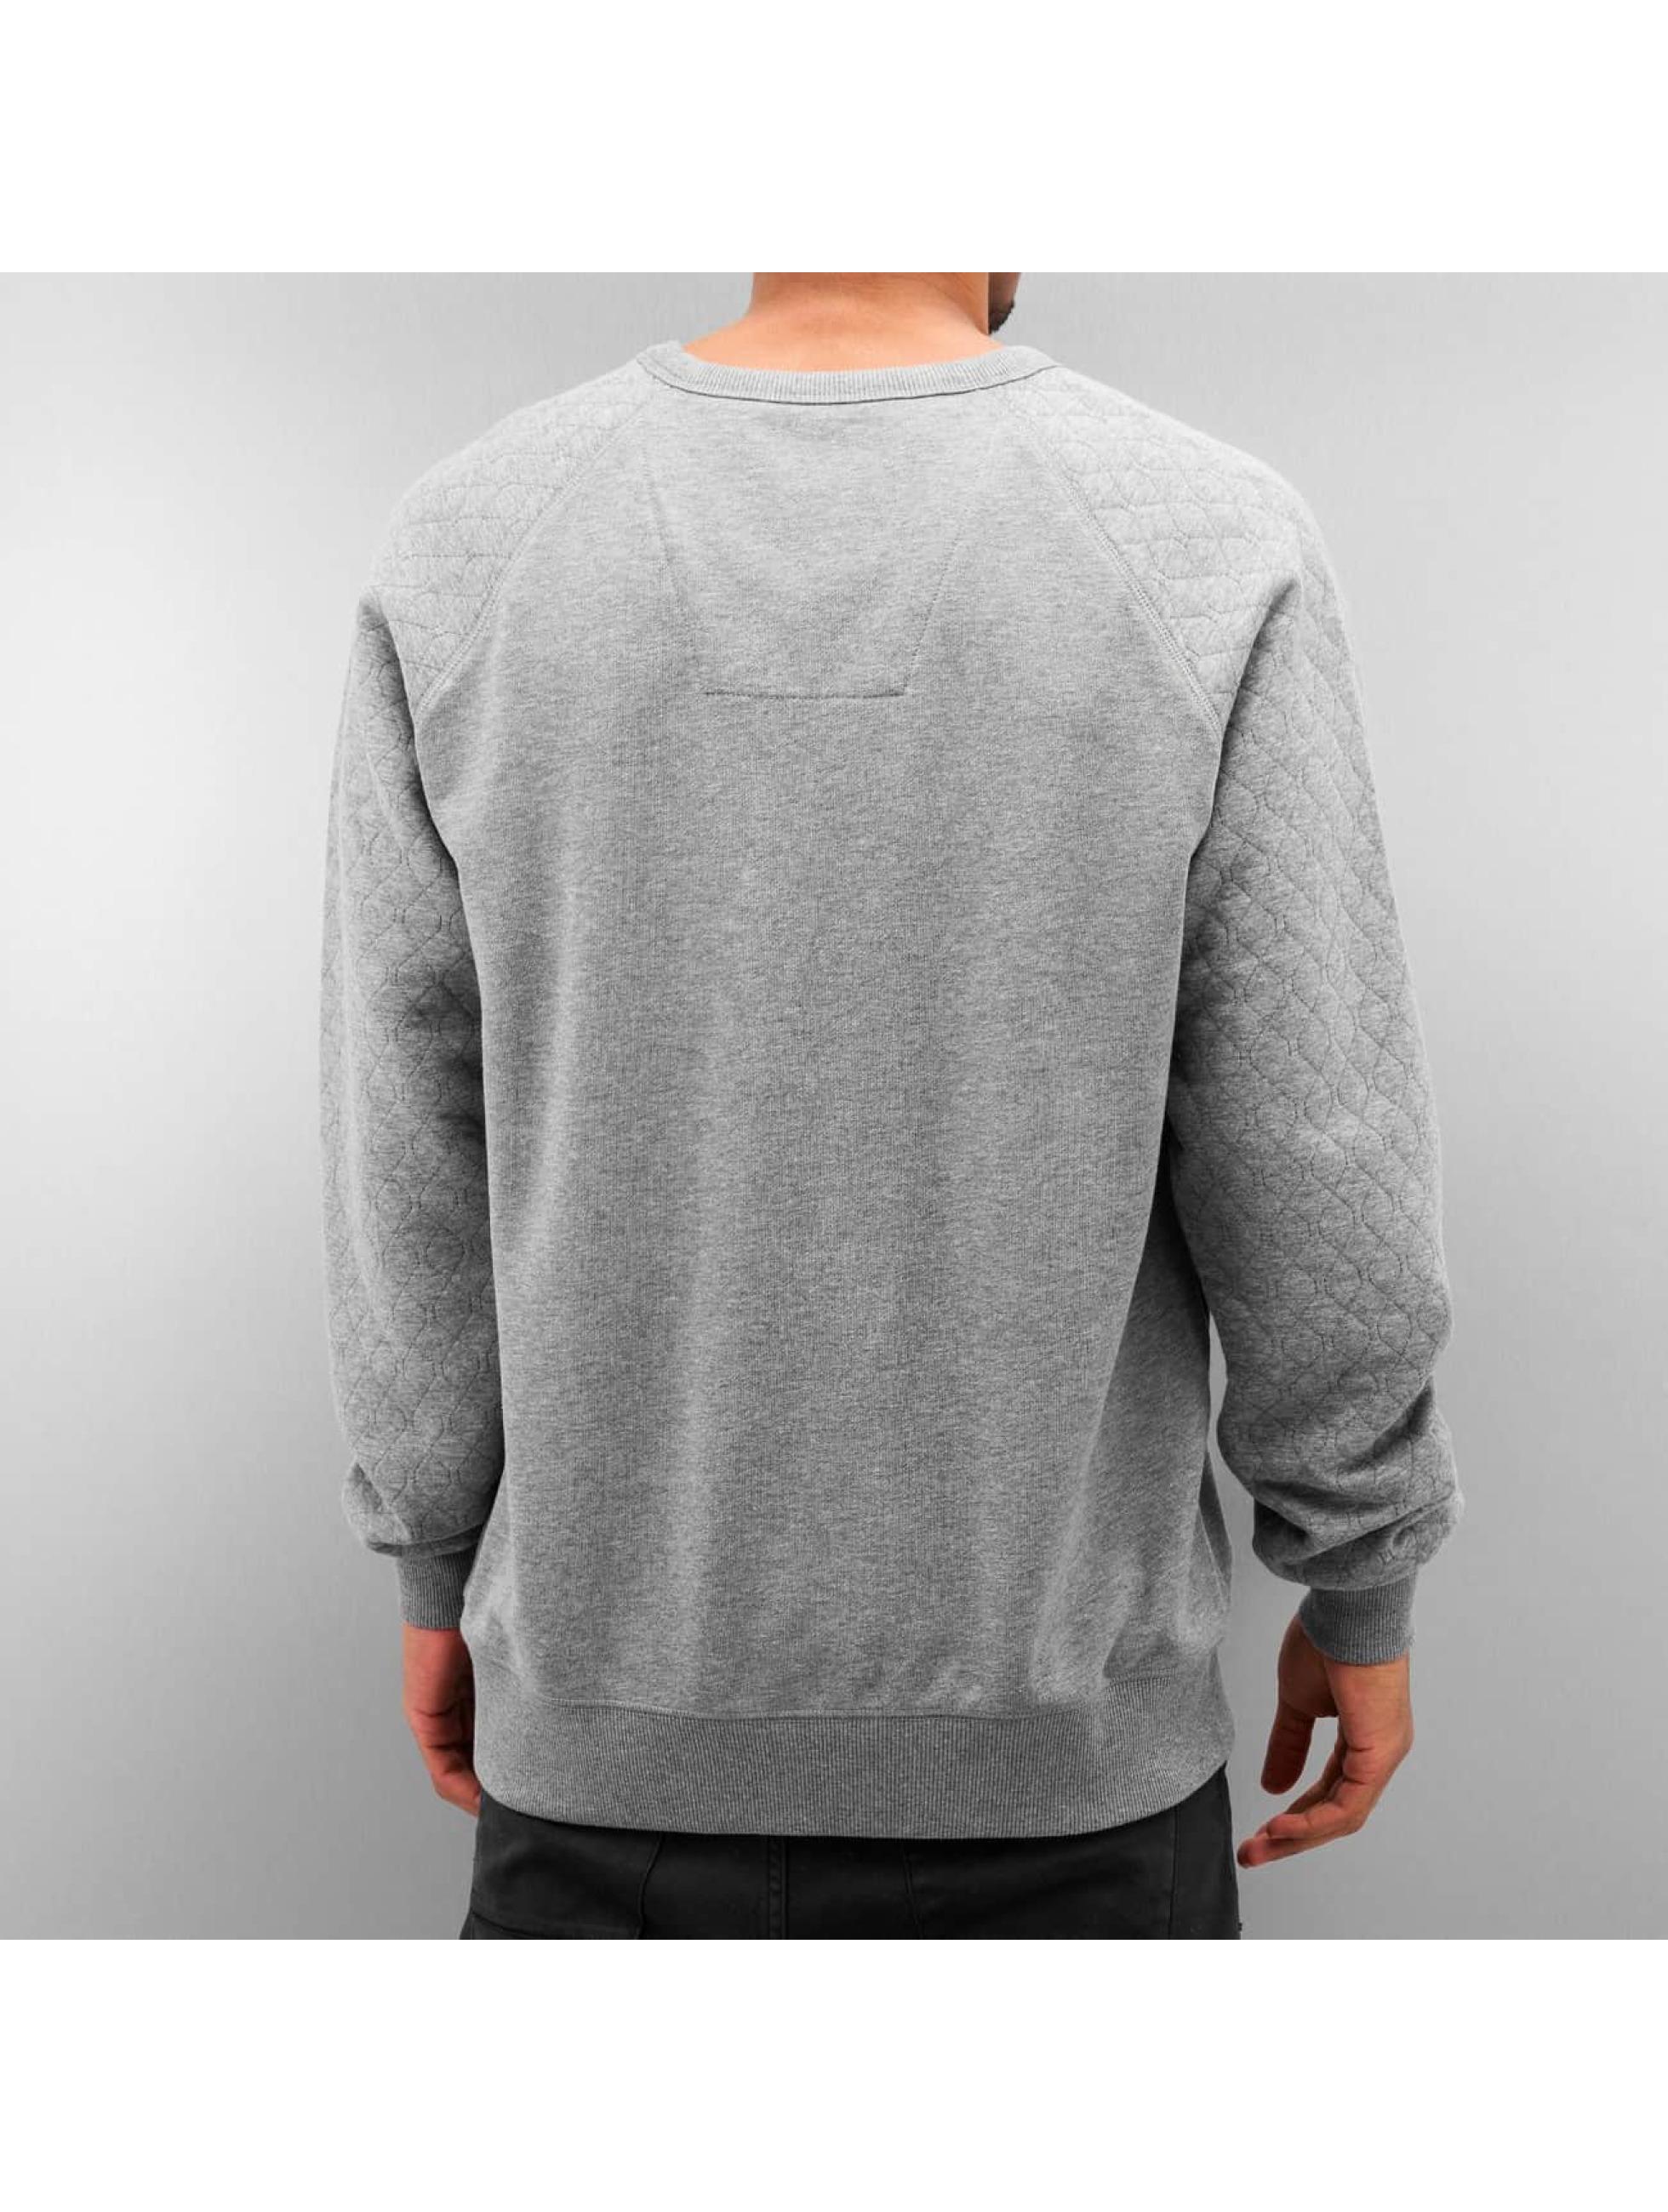 G-Star Пуловер Toublo Sherland серый